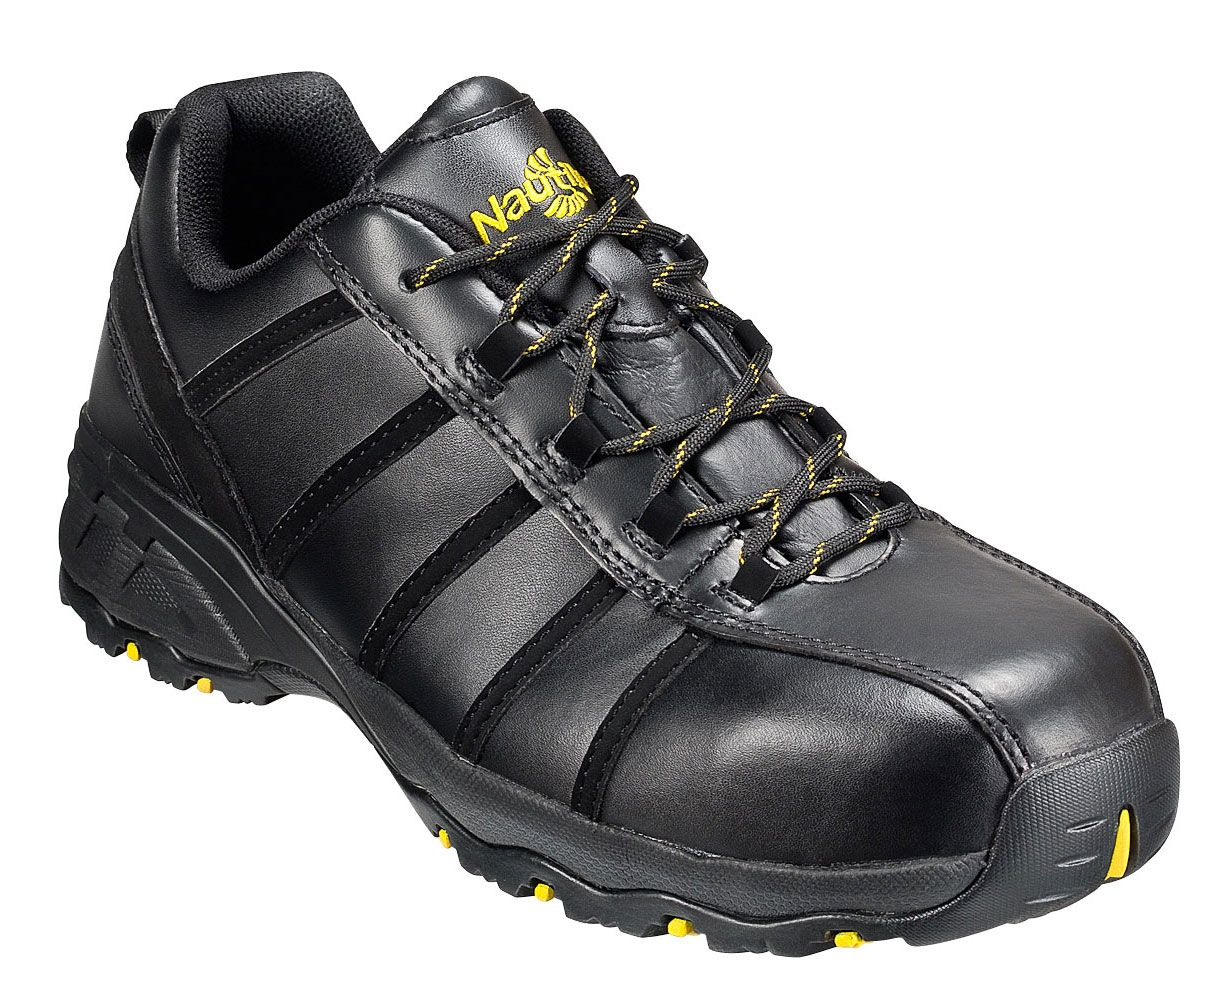 be6f78e0cad0bc N1757 Nautilus Women s Composite EH Safety Shoes - Black